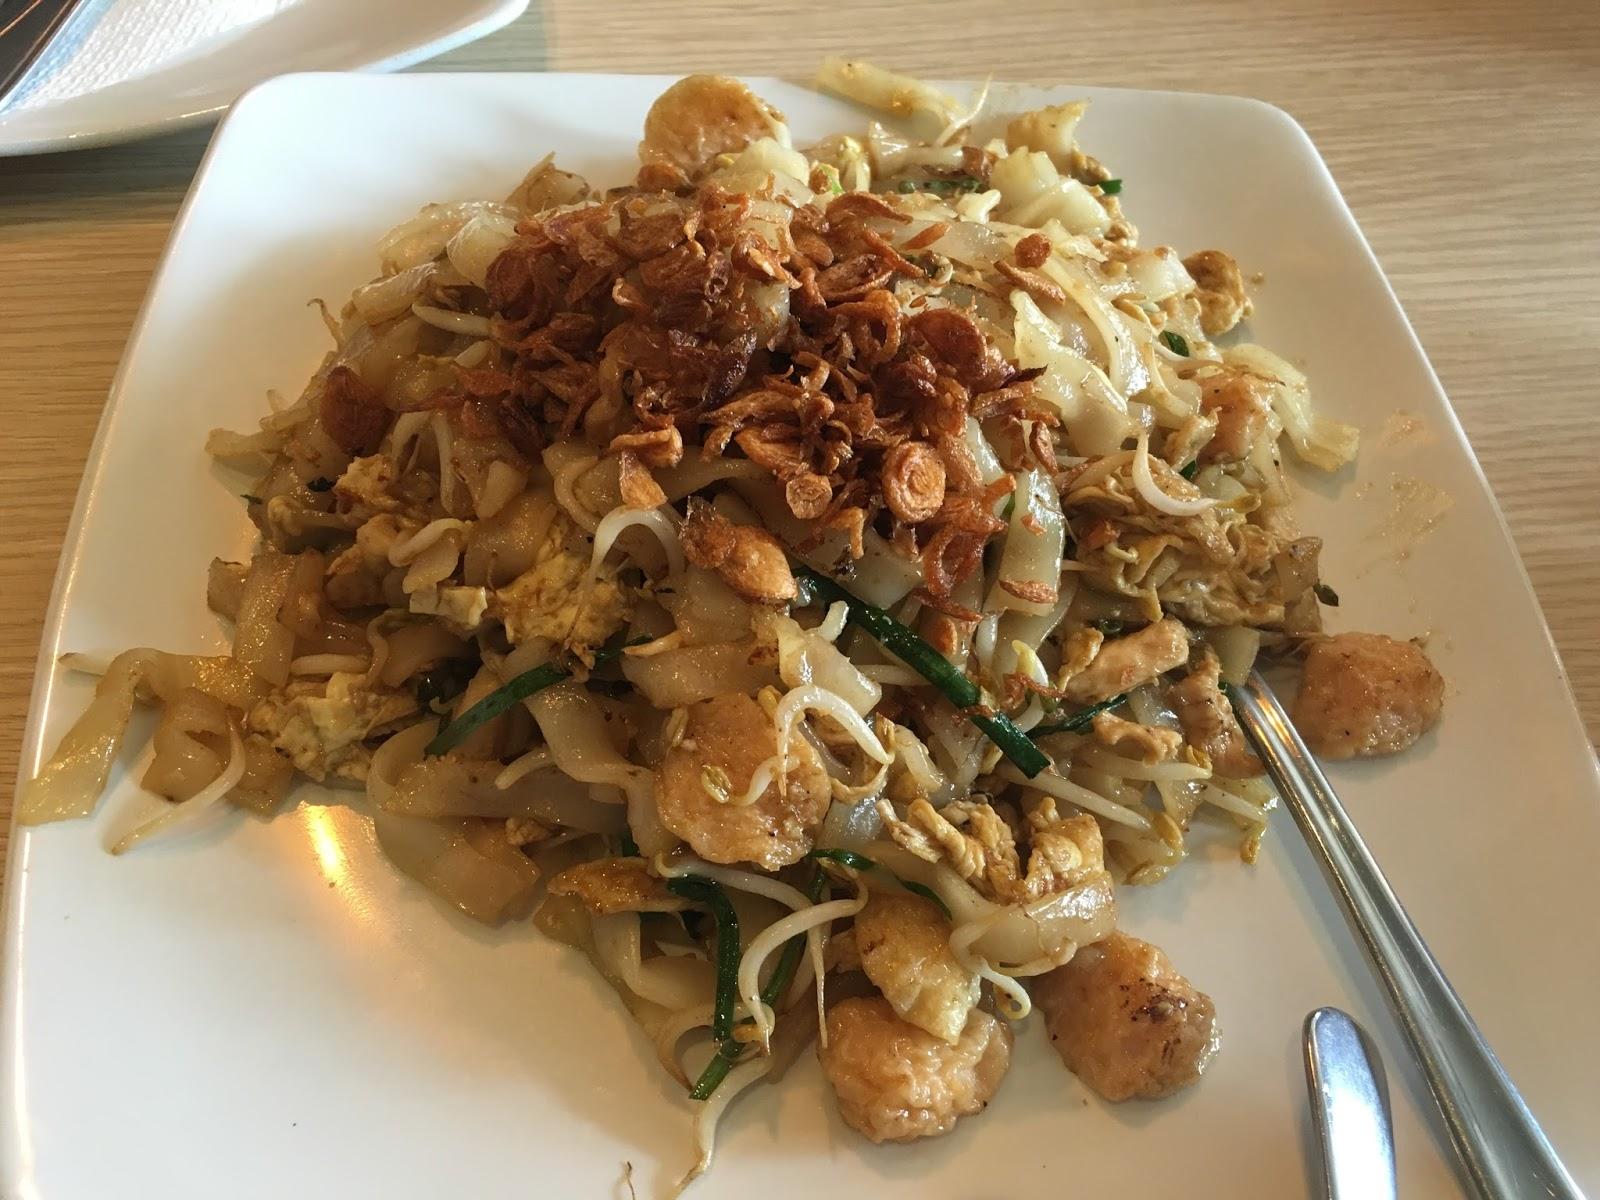 Hasil gambar untuk house of wok malang